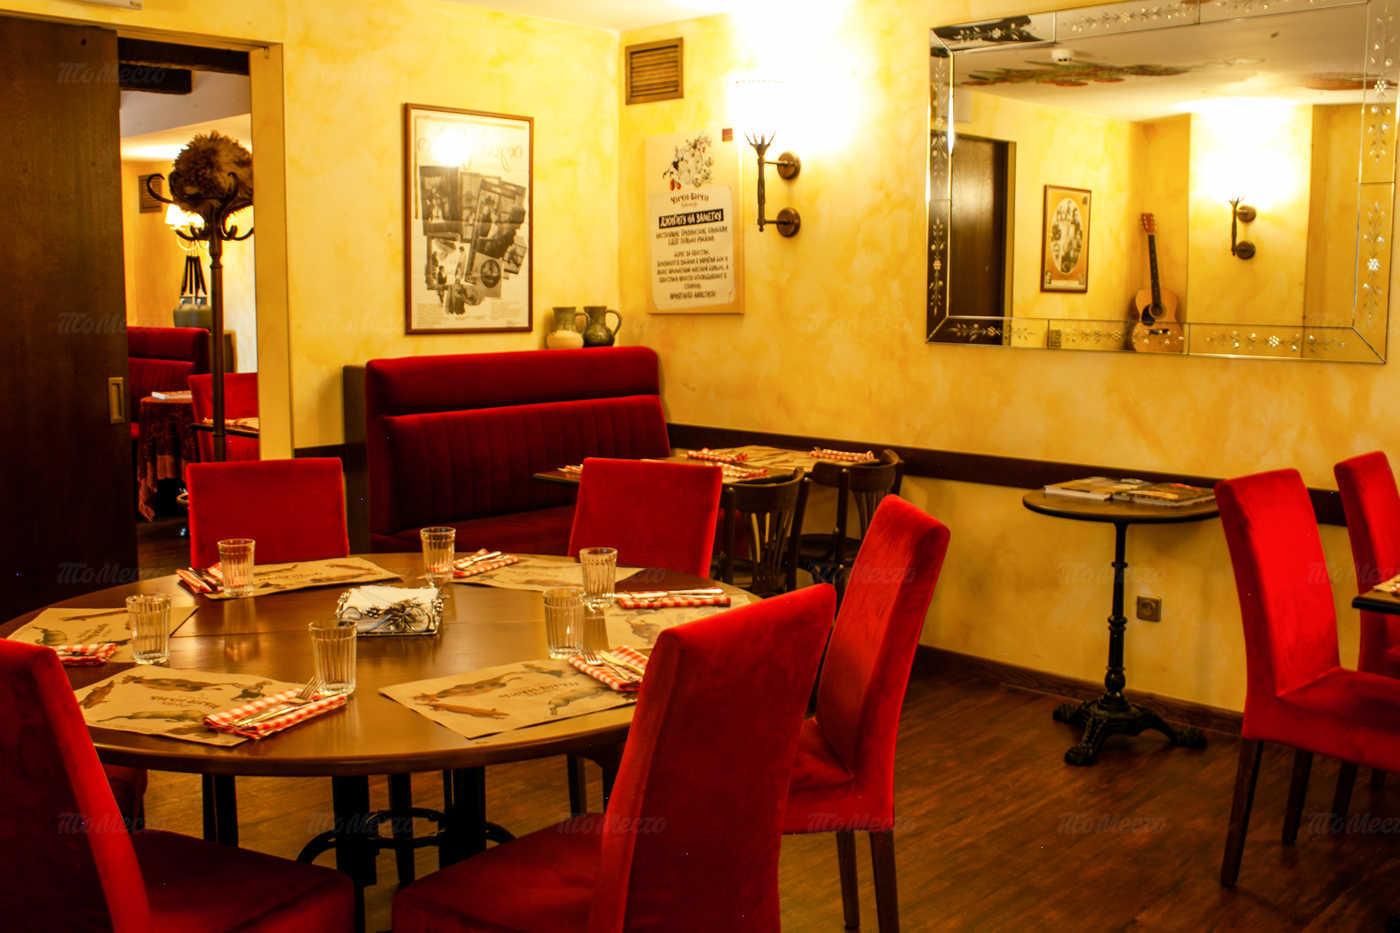 Ресторан Чичи-Бичи (Сhichi-Bichi) на Малой Морской